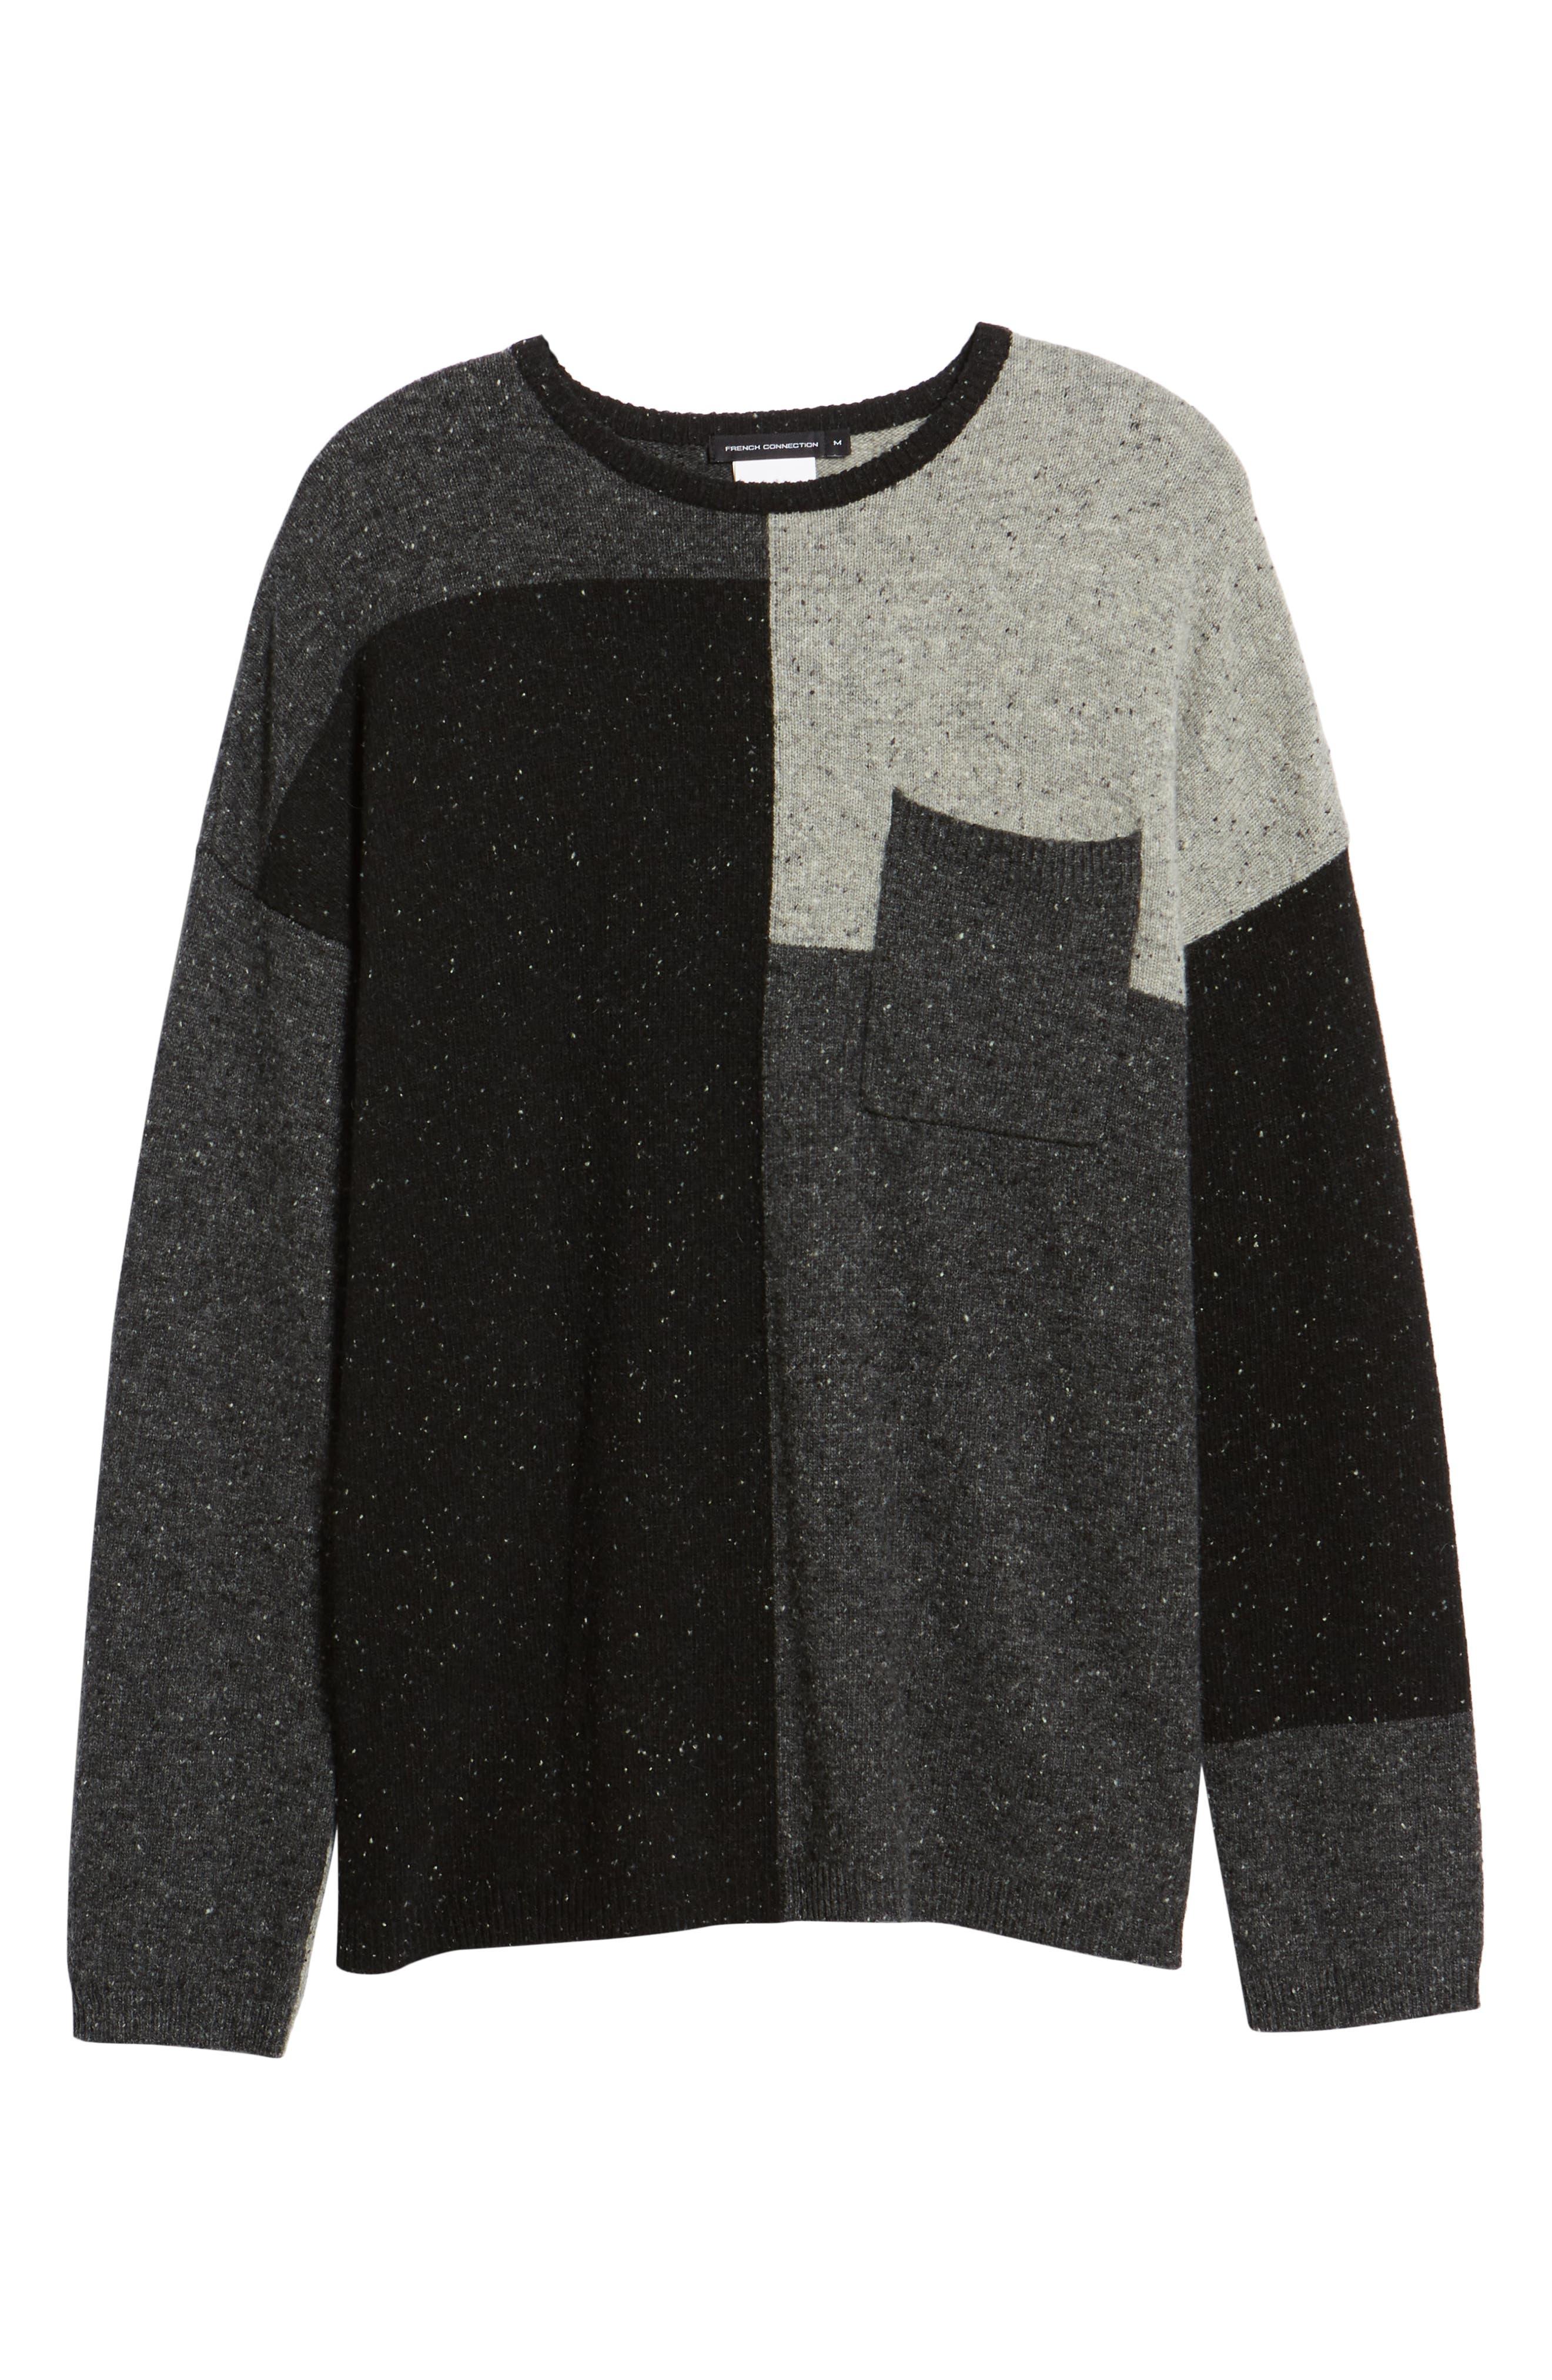 Patchwork Donegal Wool Blend Sweater,                             Alternate thumbnail 6, color,                             LIGHT GREY MELANGE CHARCOAL